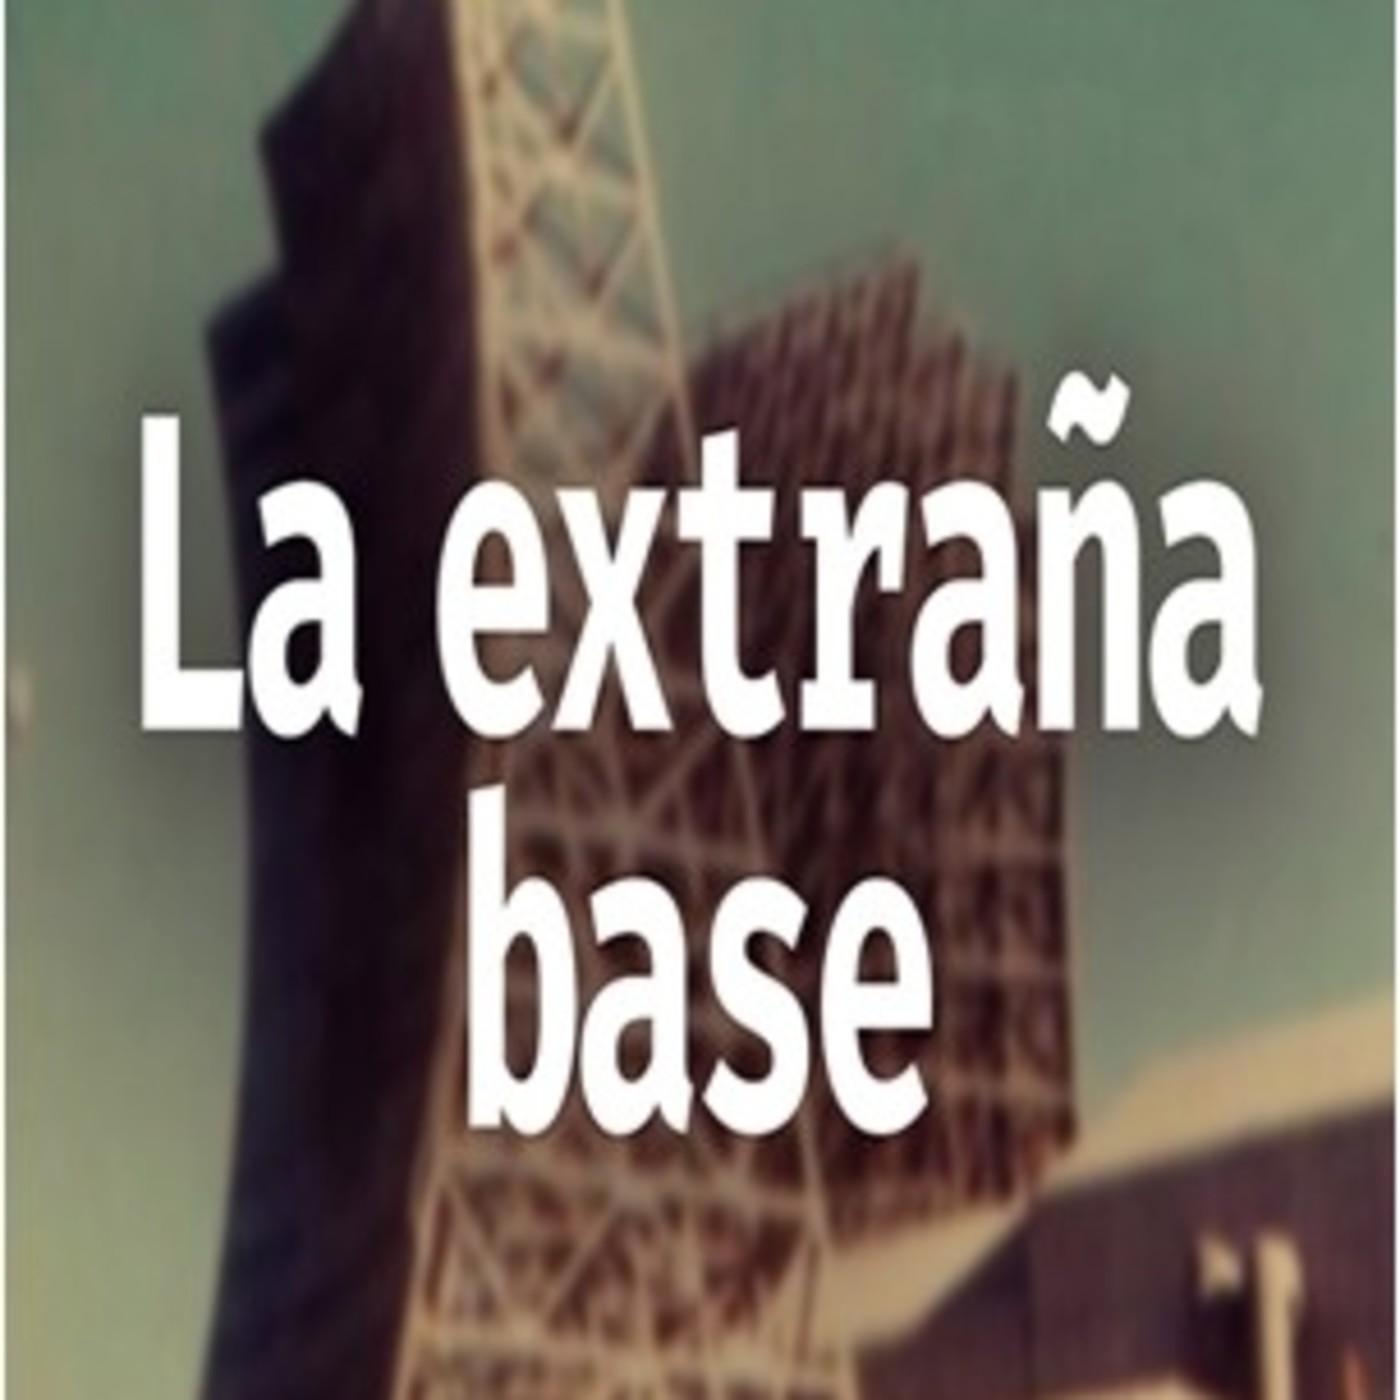 Cuarto milenio: La extraña base en Cuarto Milenio (Oficial ...